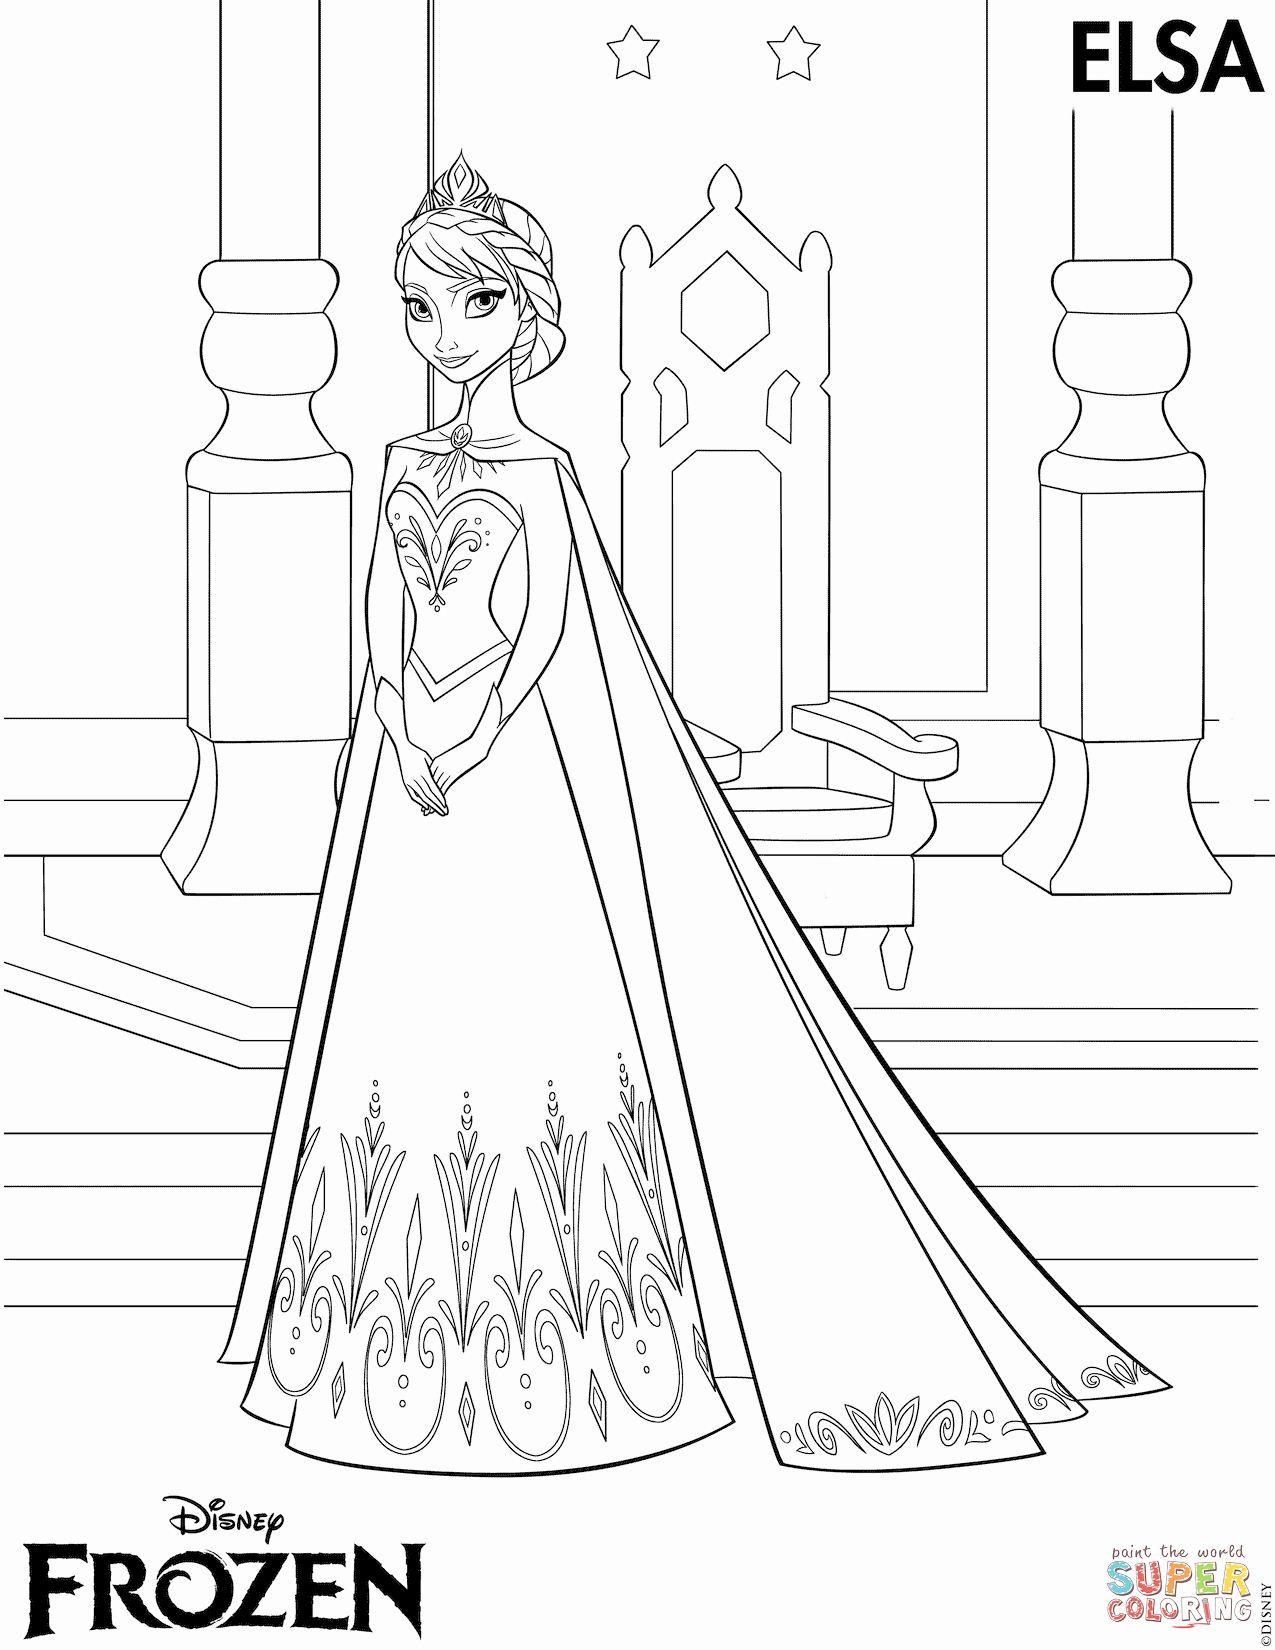 Free Elsa Coloring Page Awesome Elsa Coronation Coloring Page Frozen Coloring Pages Elsa Coloring Pages Elsa Coloring